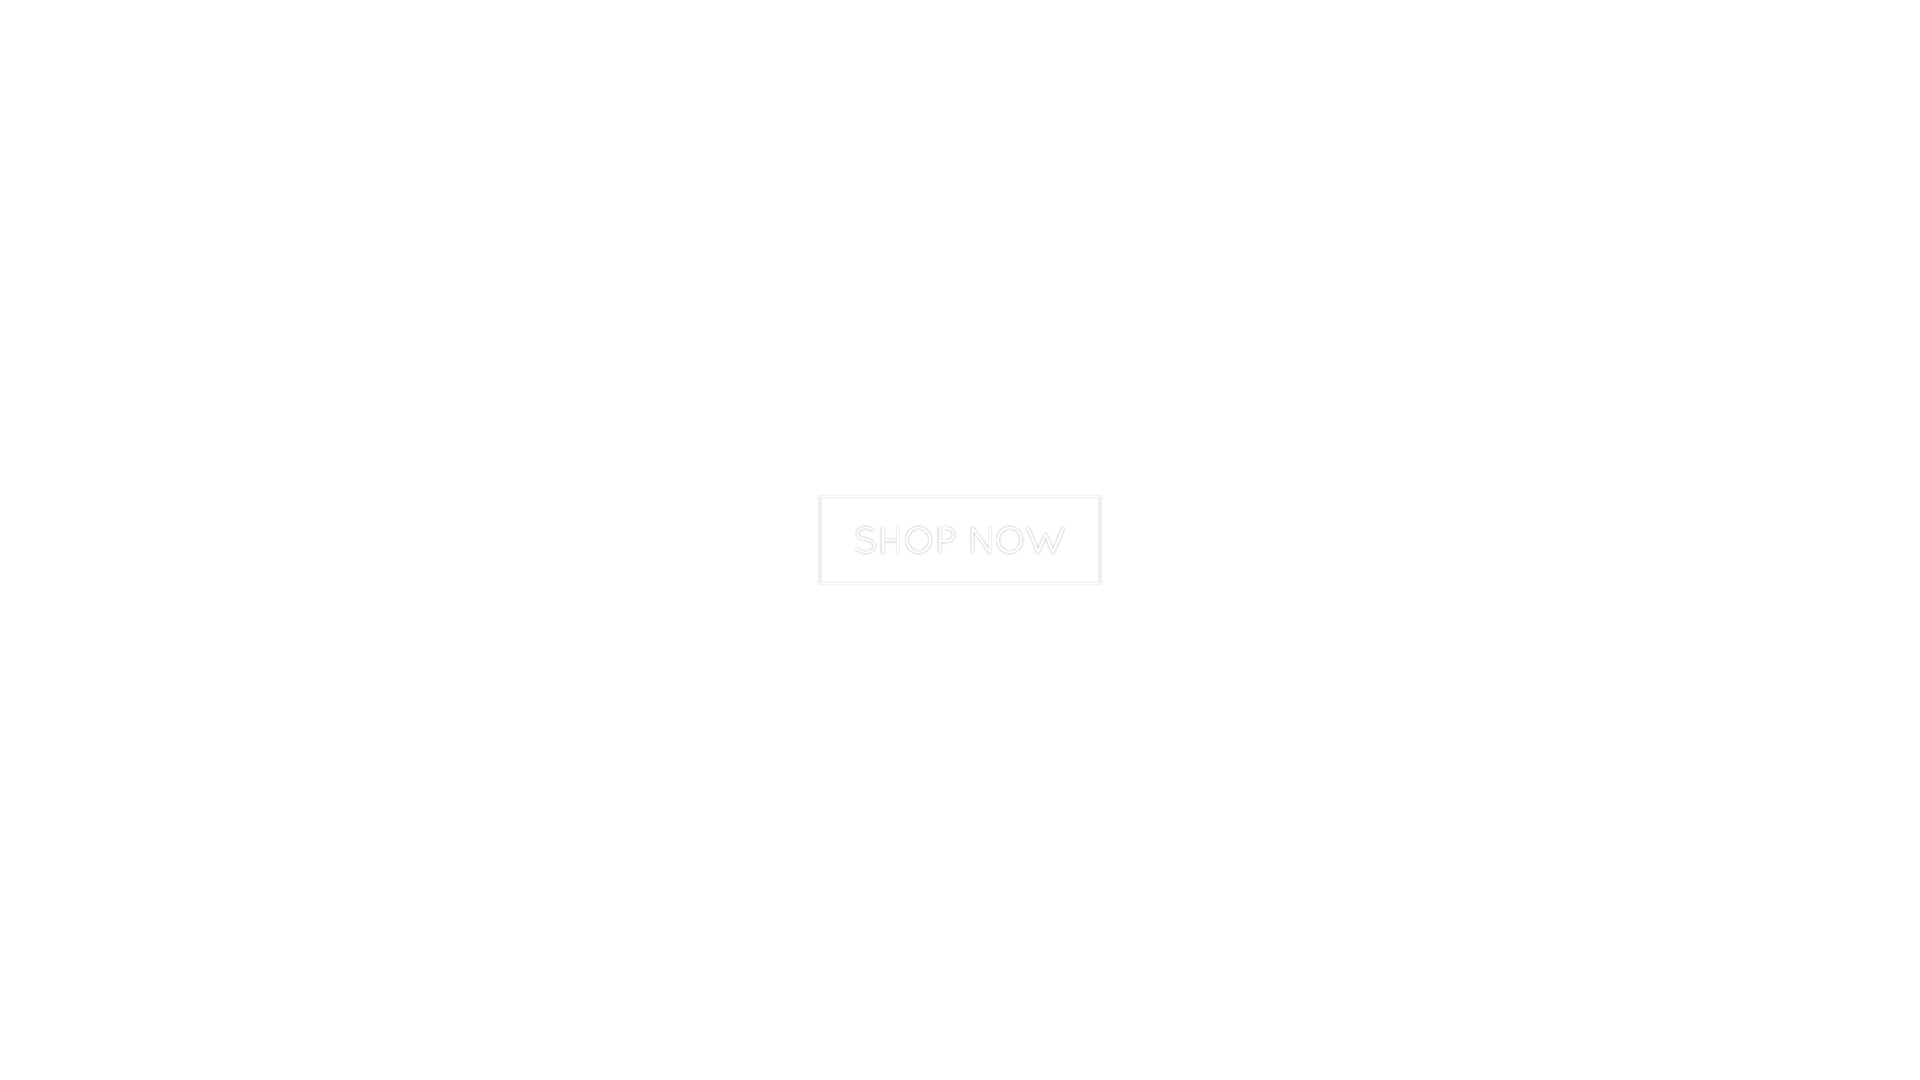 shop-now-bouton